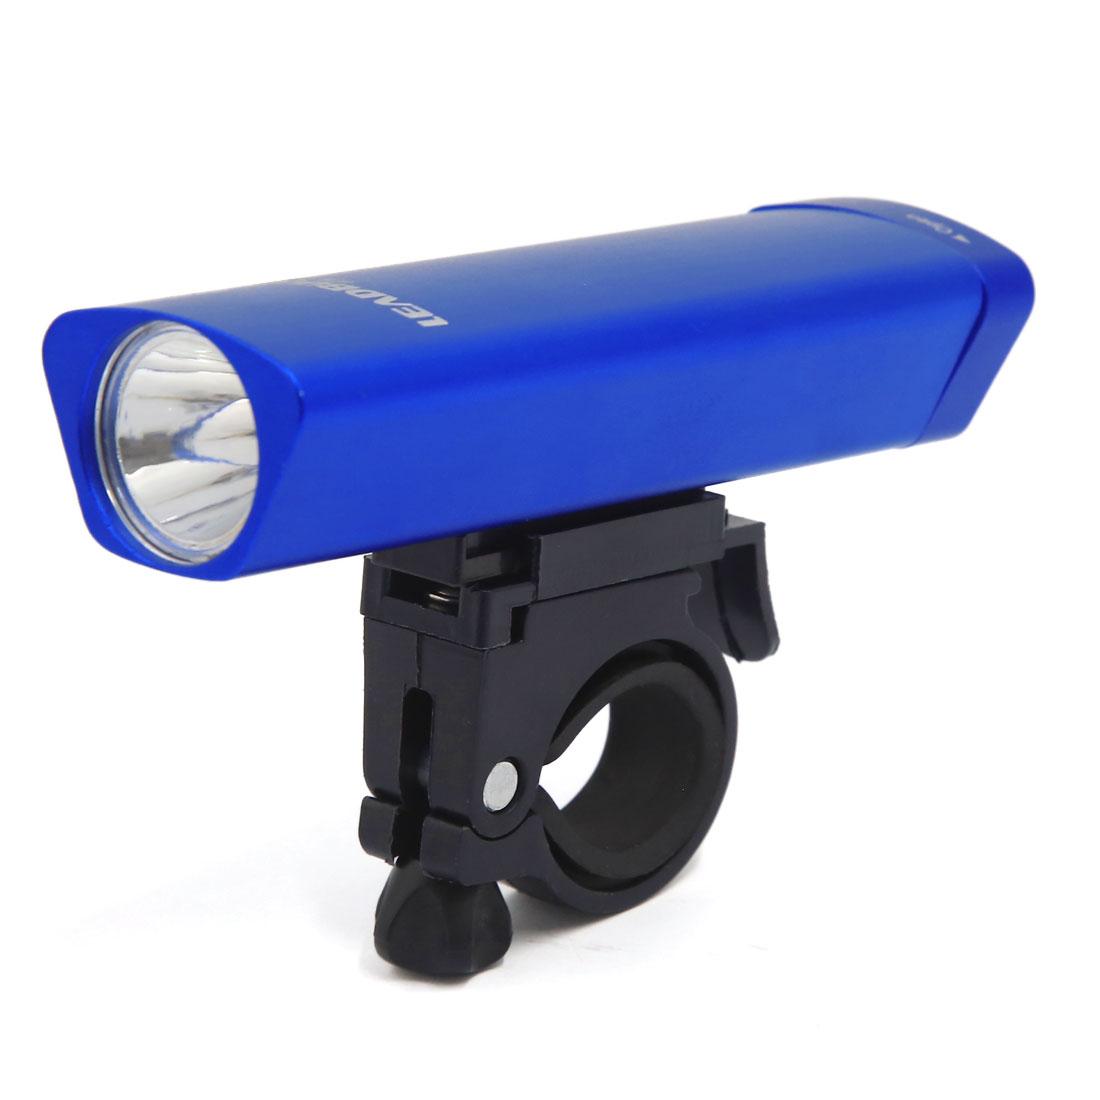 Adjustable Cycling Bicycle Front White LED Mount Holder Handlebar Flash Light Blue